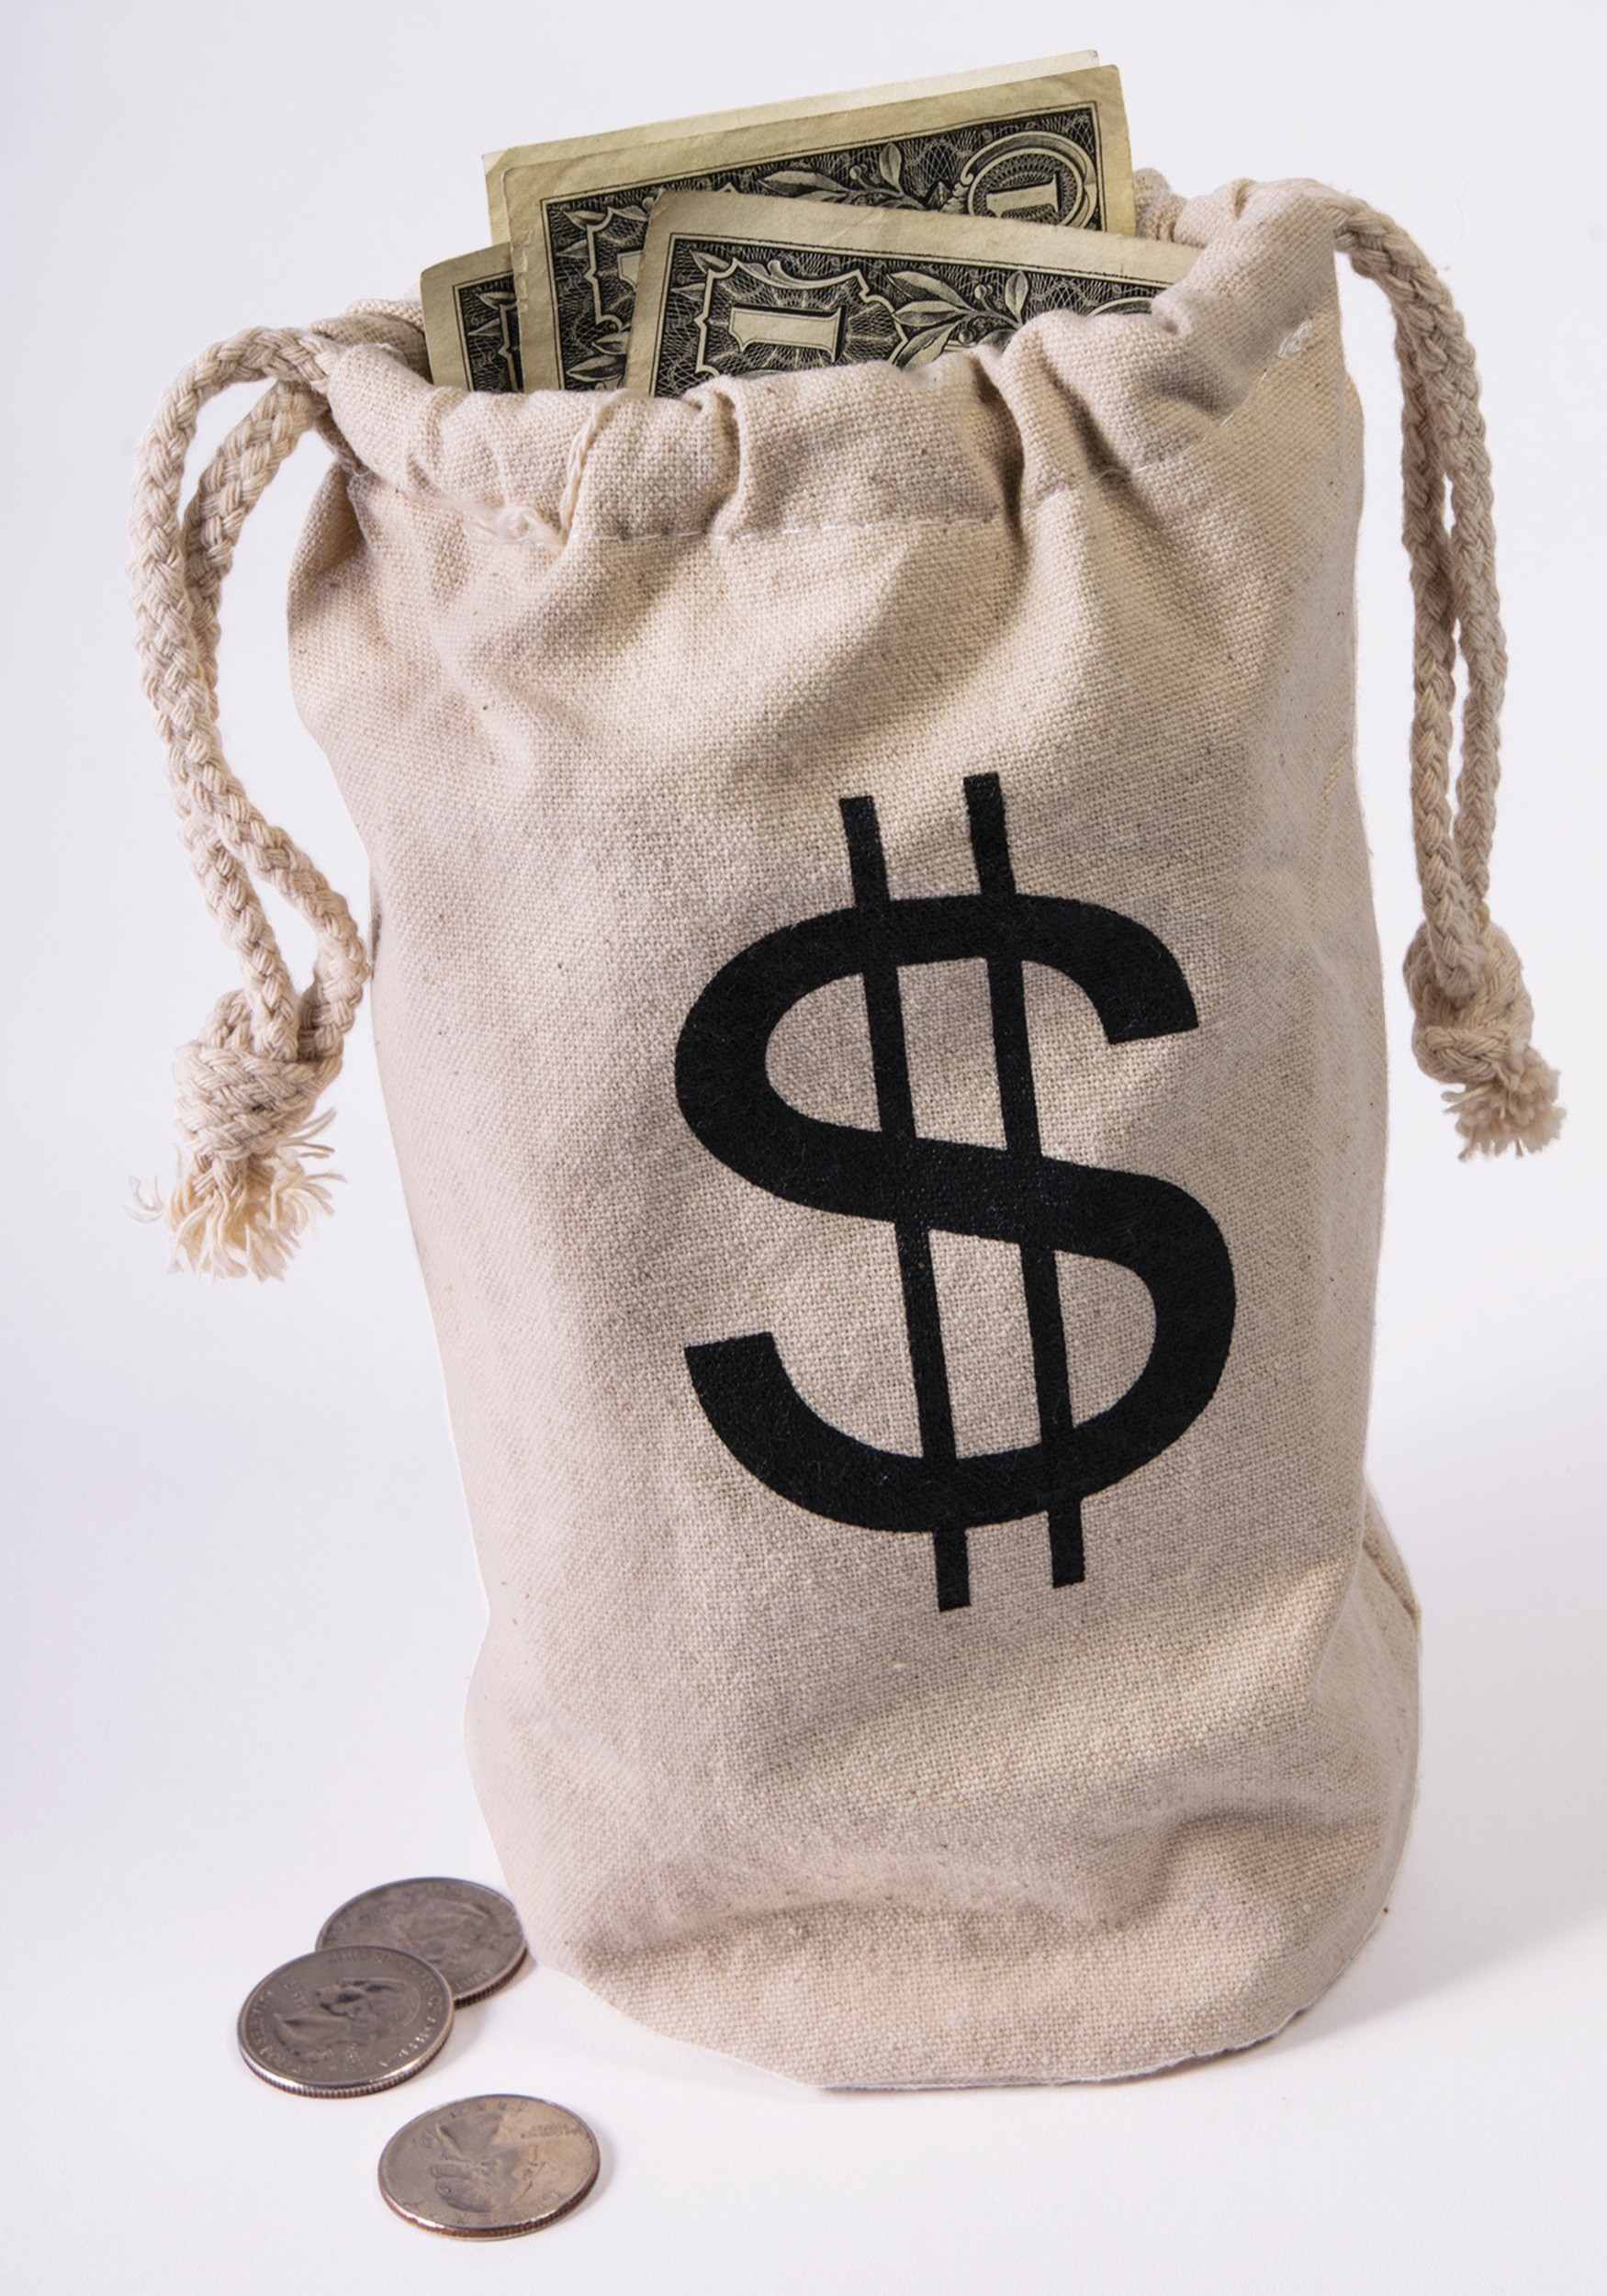 banking money - photo #2